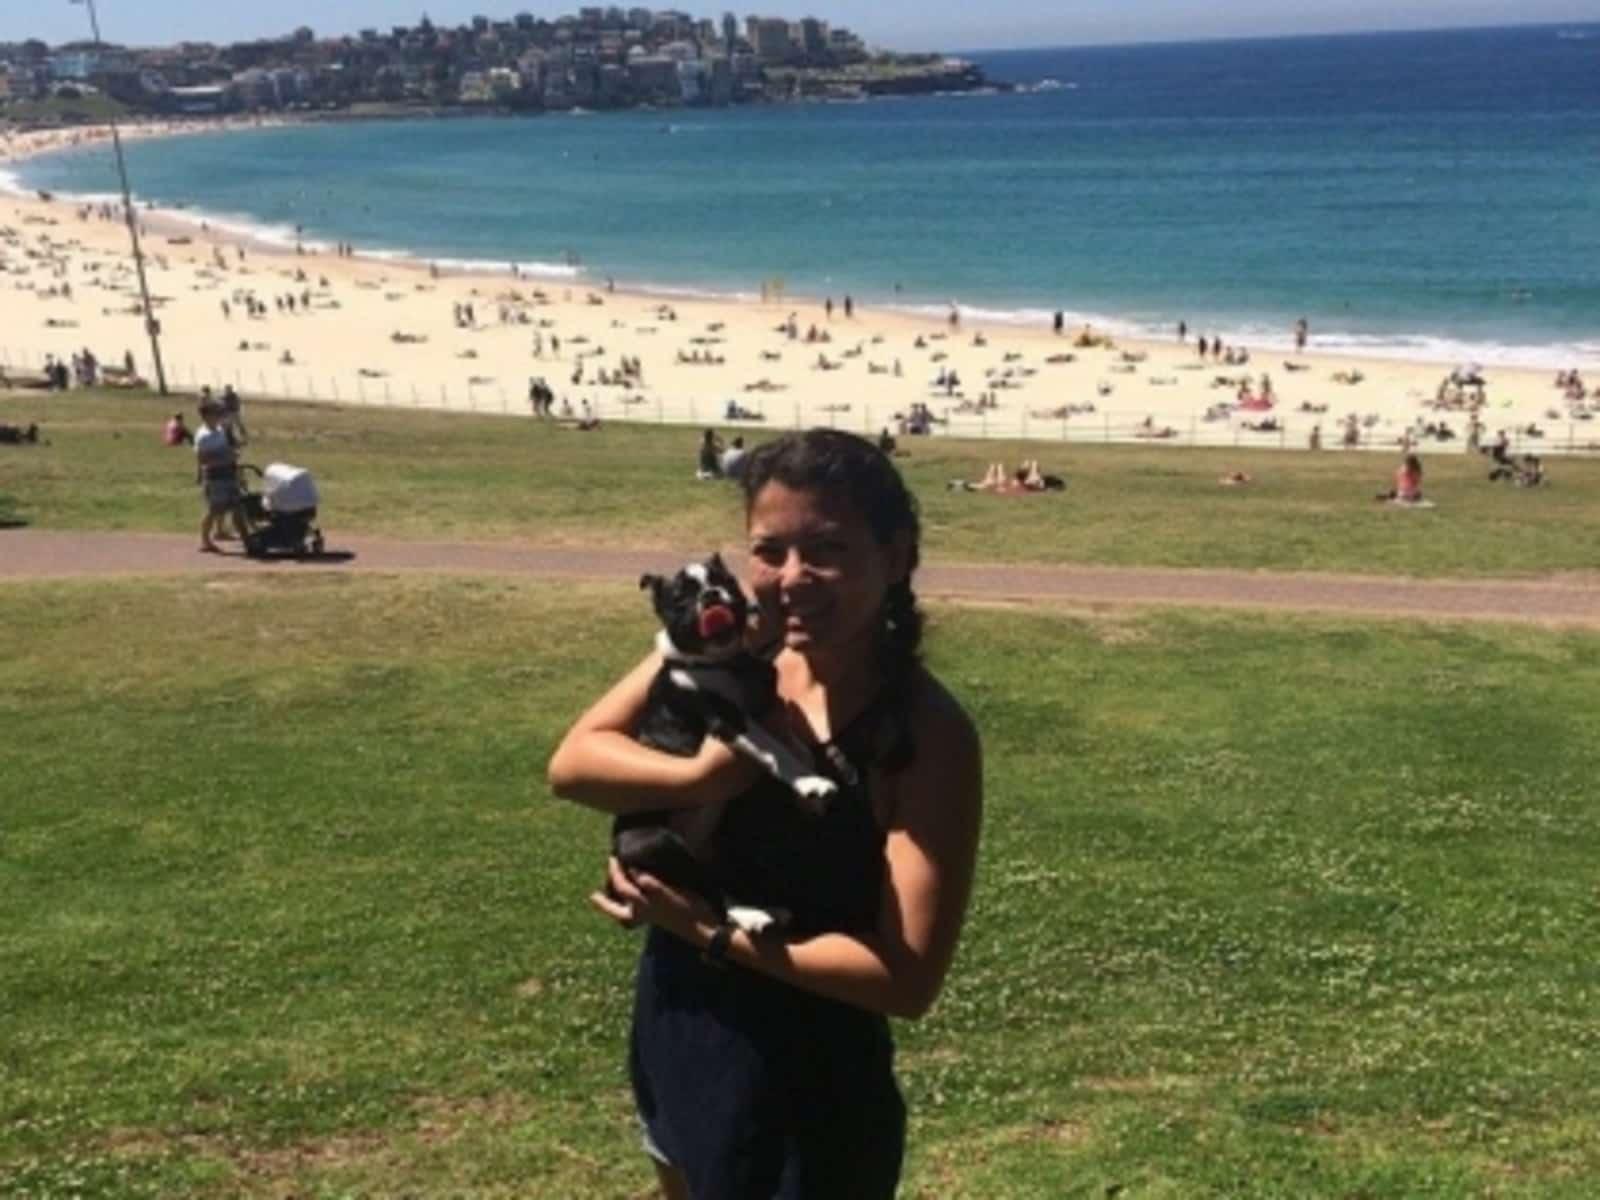 Miriam miyuki from Sydney, New South Wales, Australia